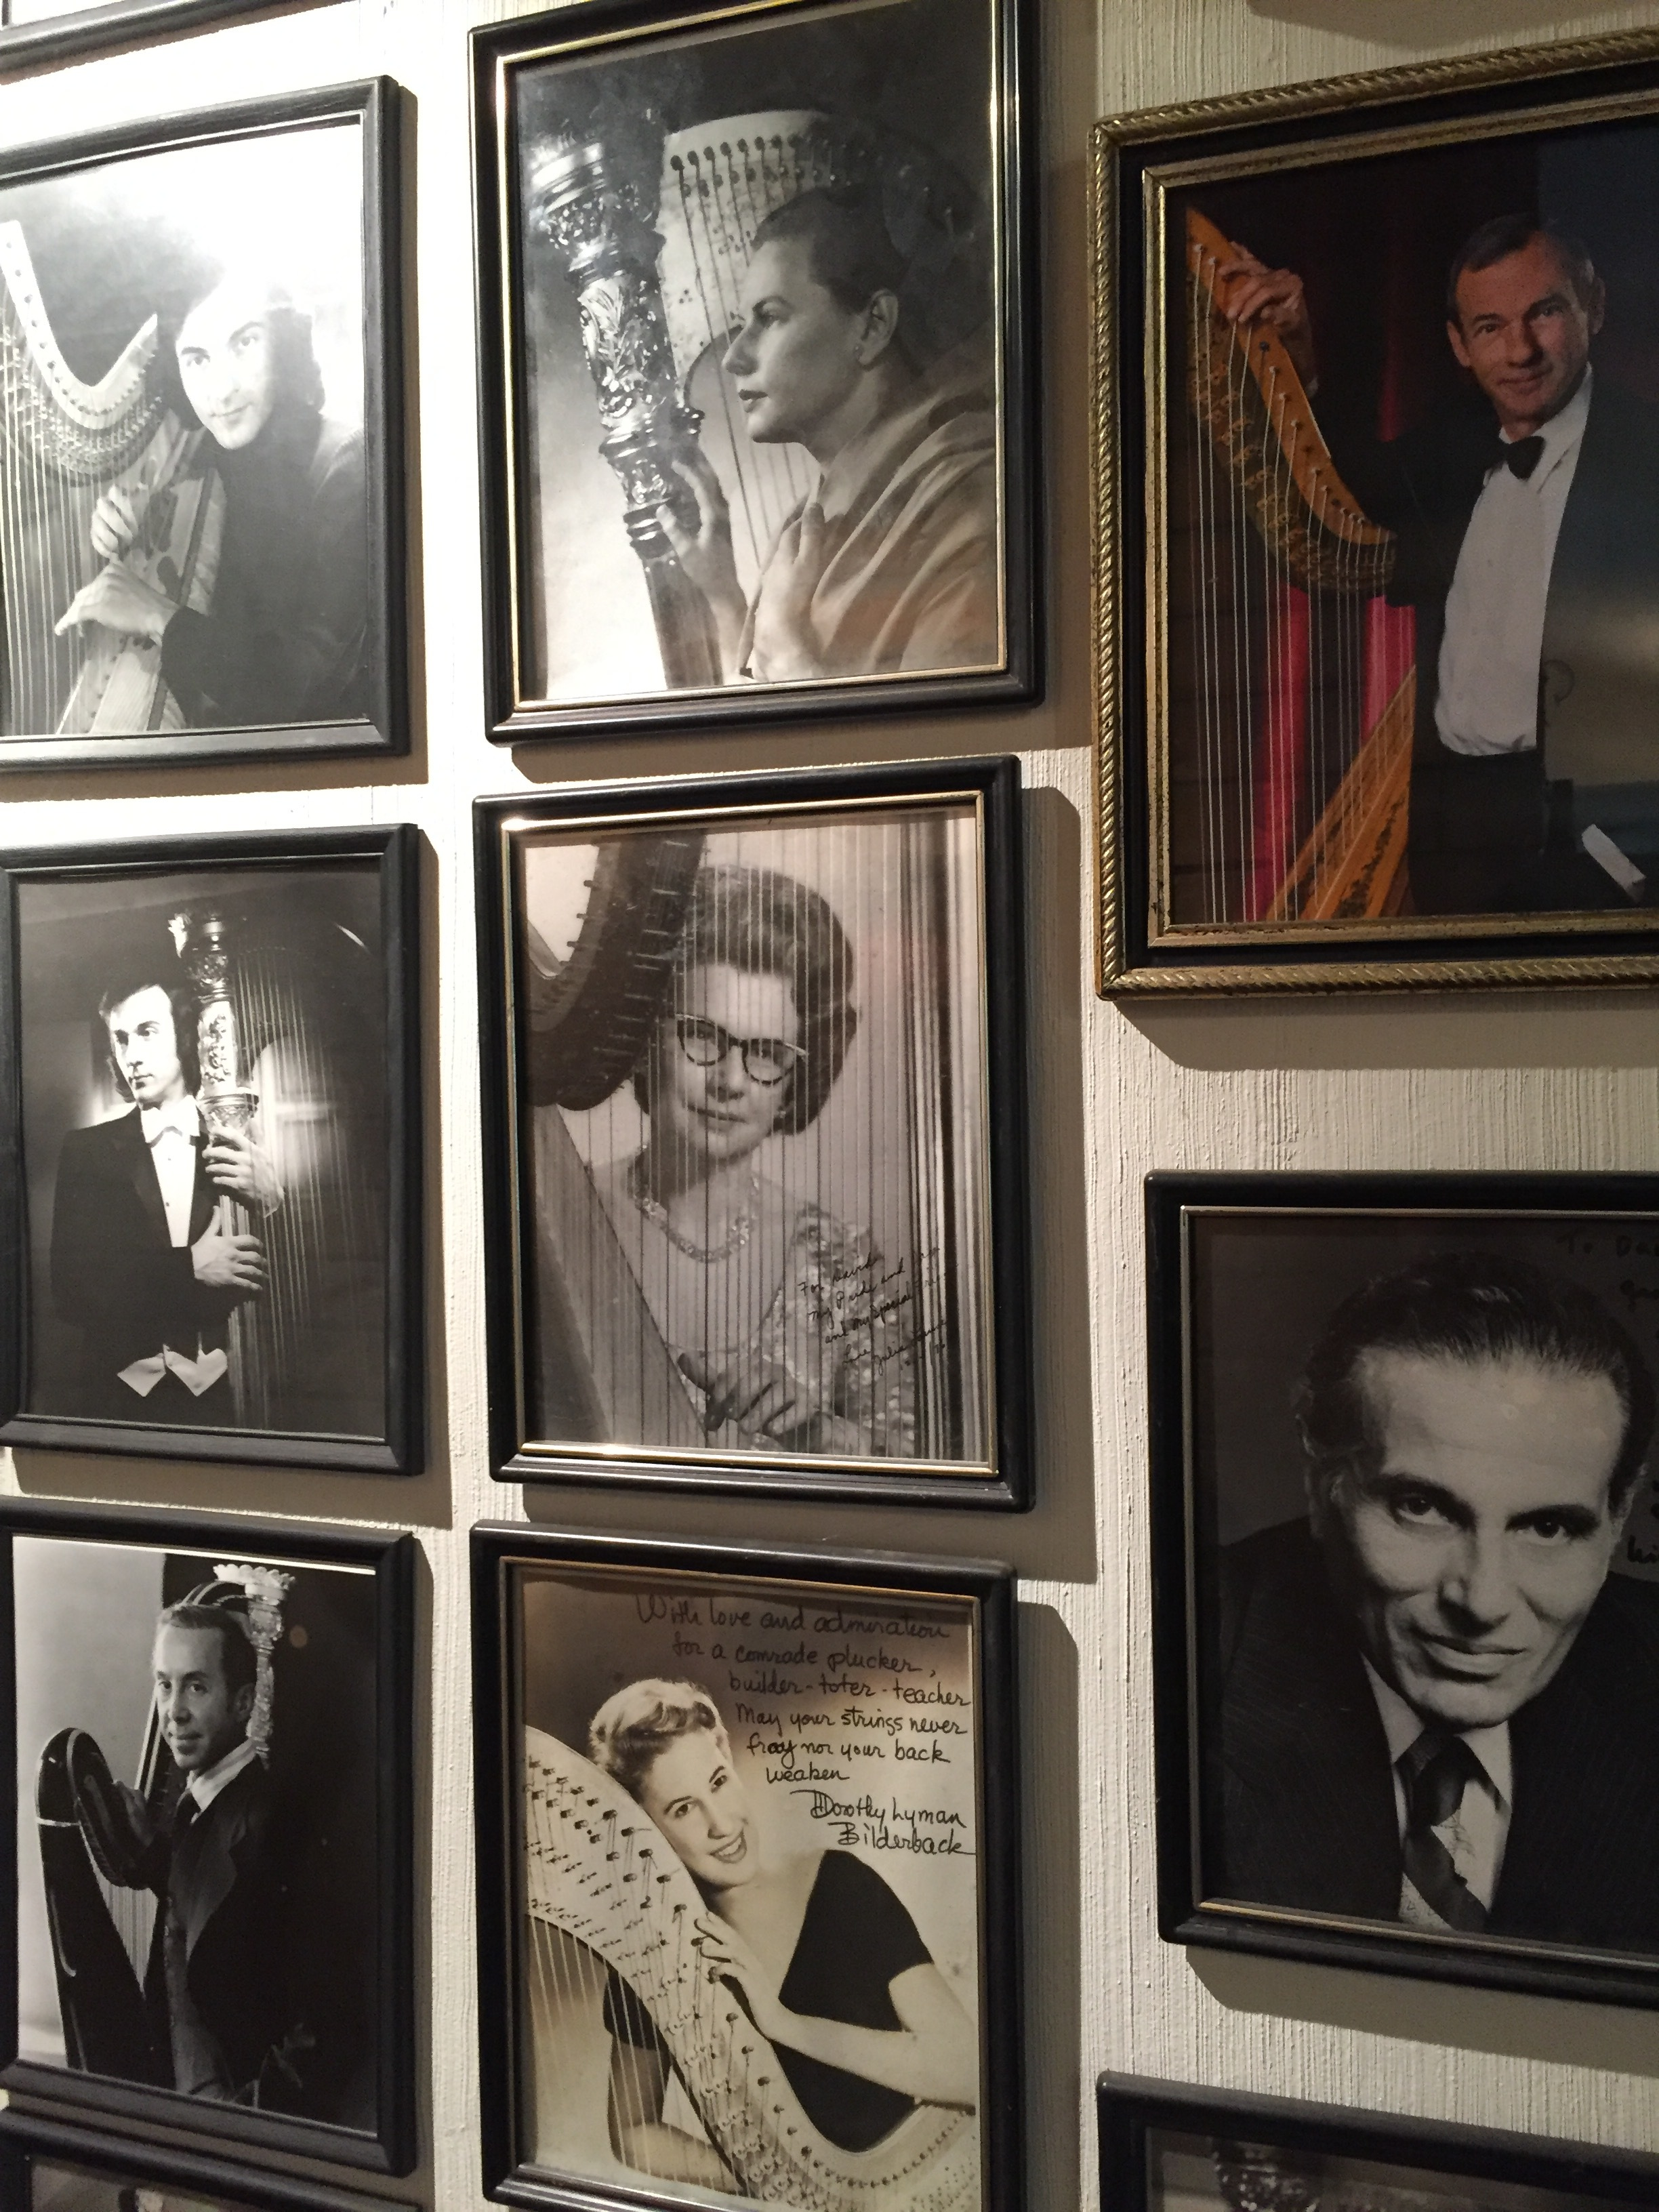 David's Wall of Fame